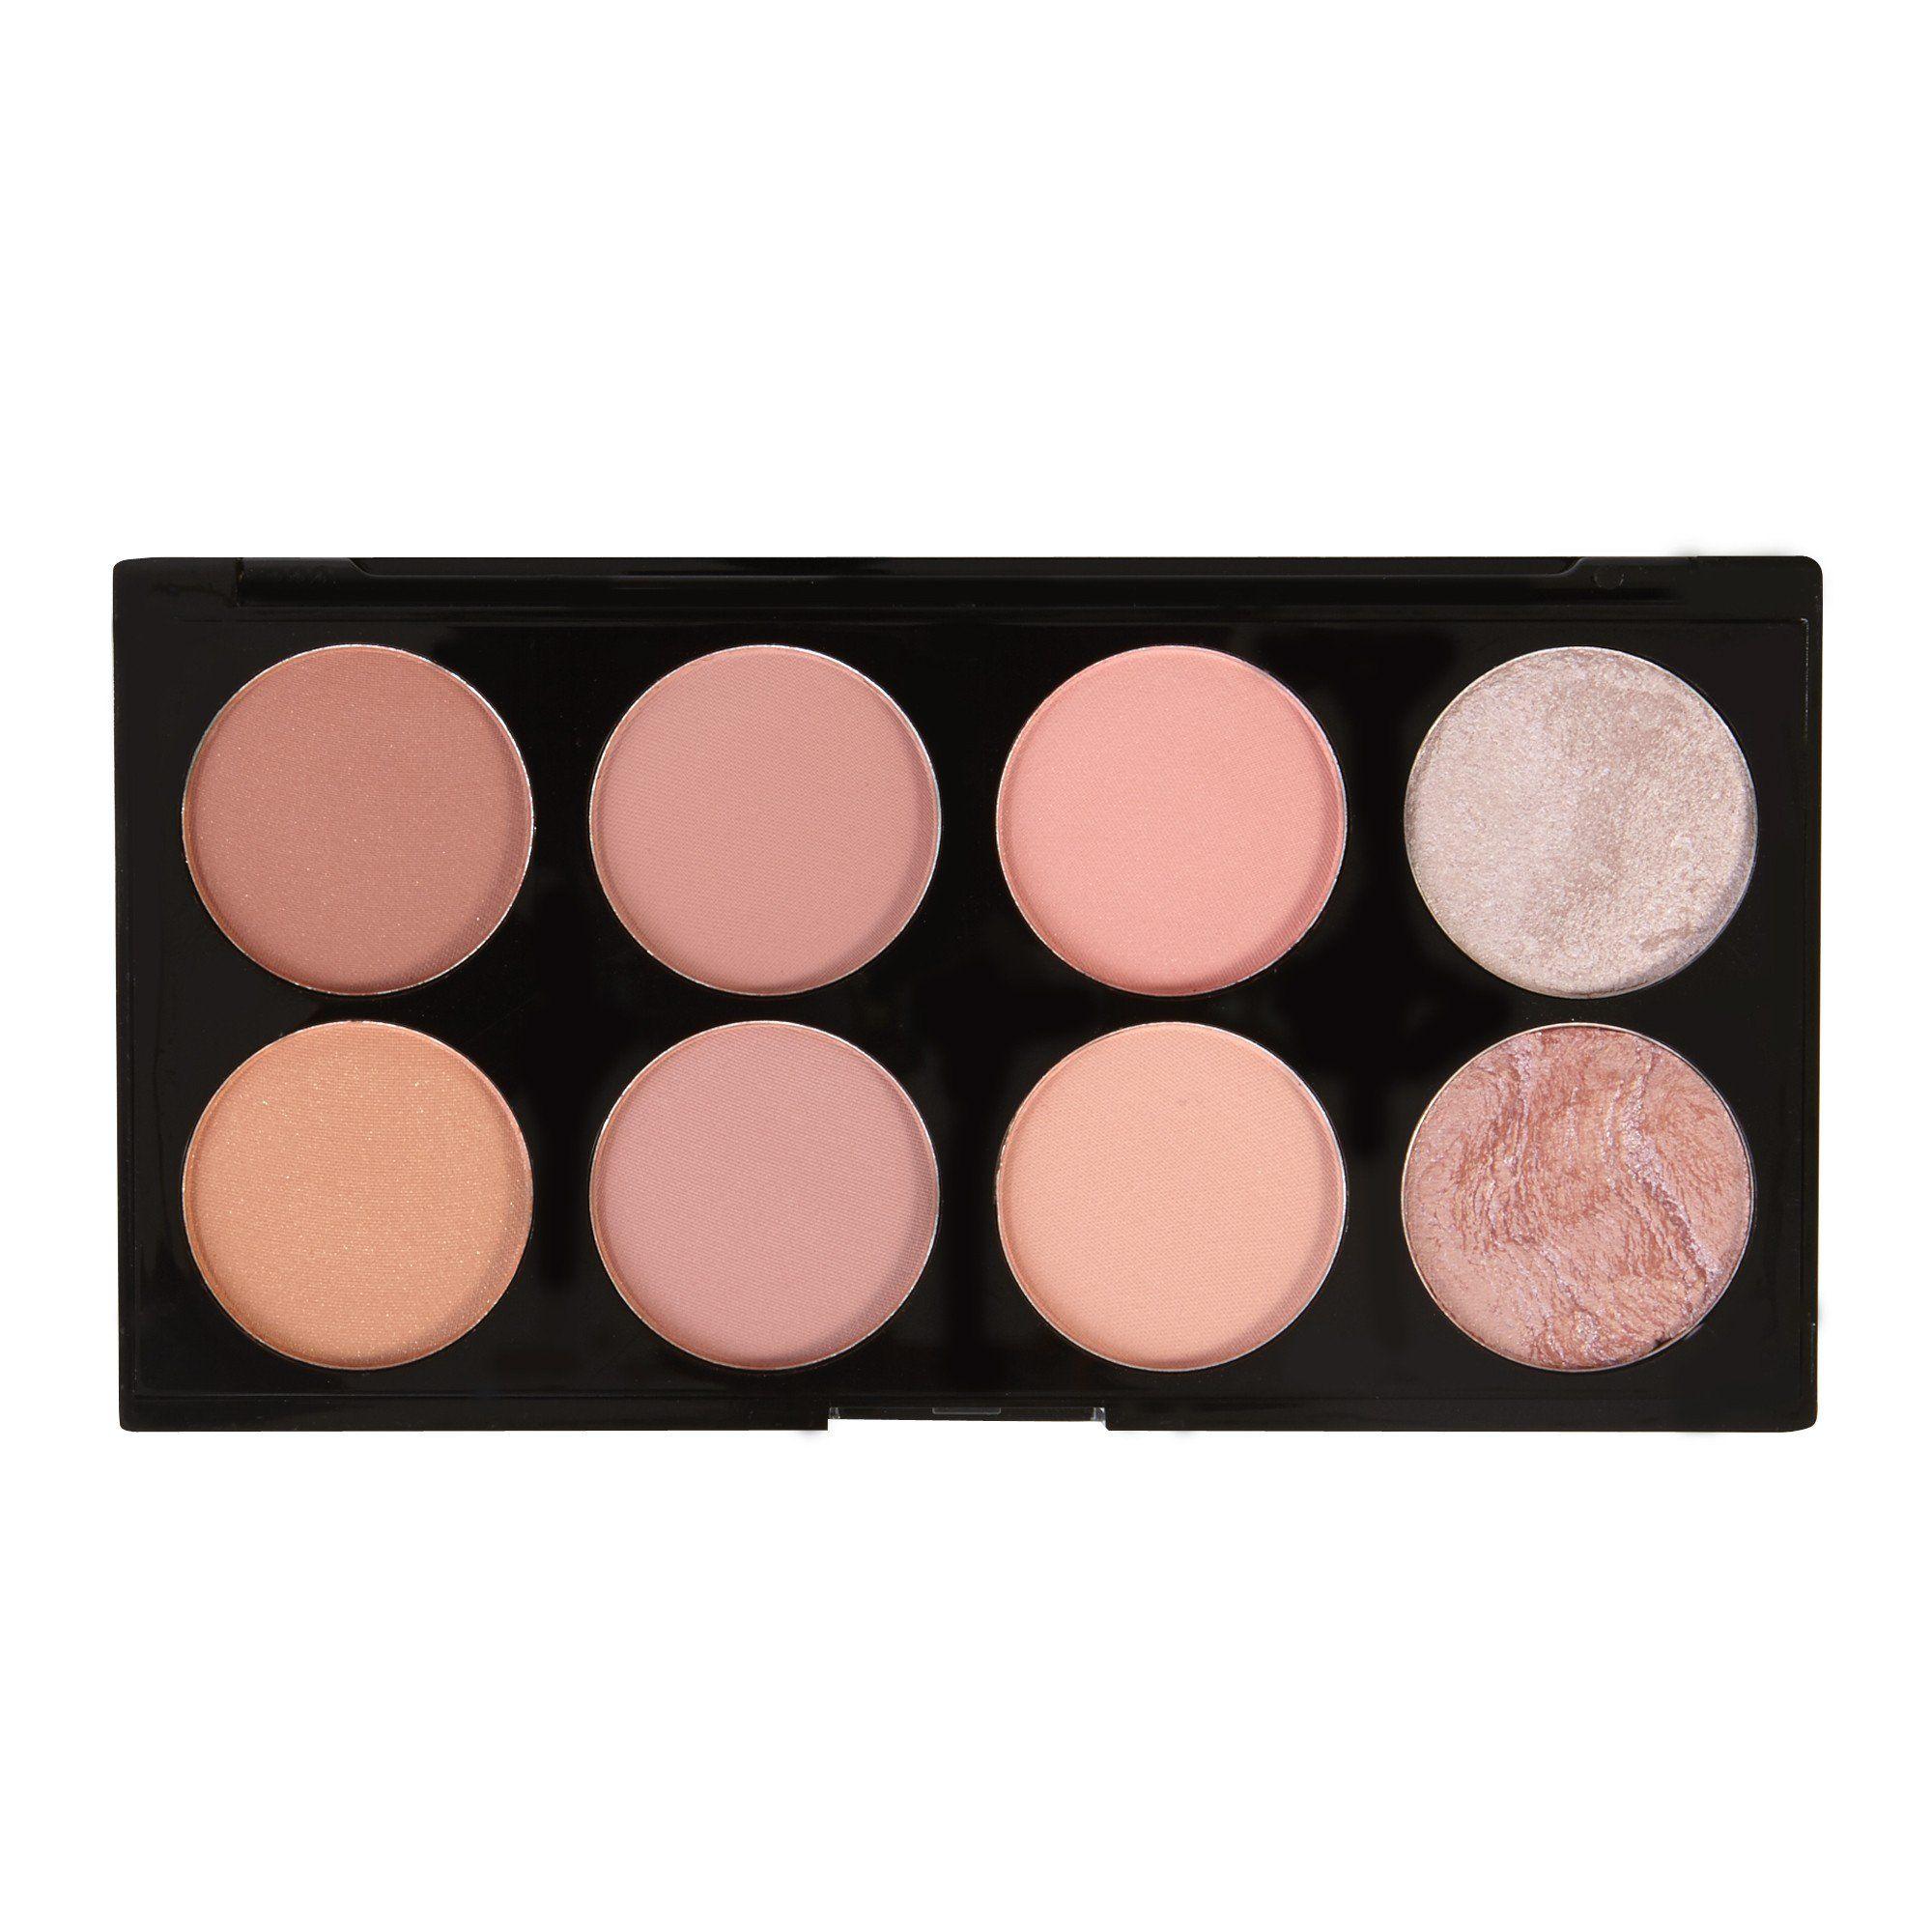 Makeup Revolution Blush Palette Hot Spice Blush